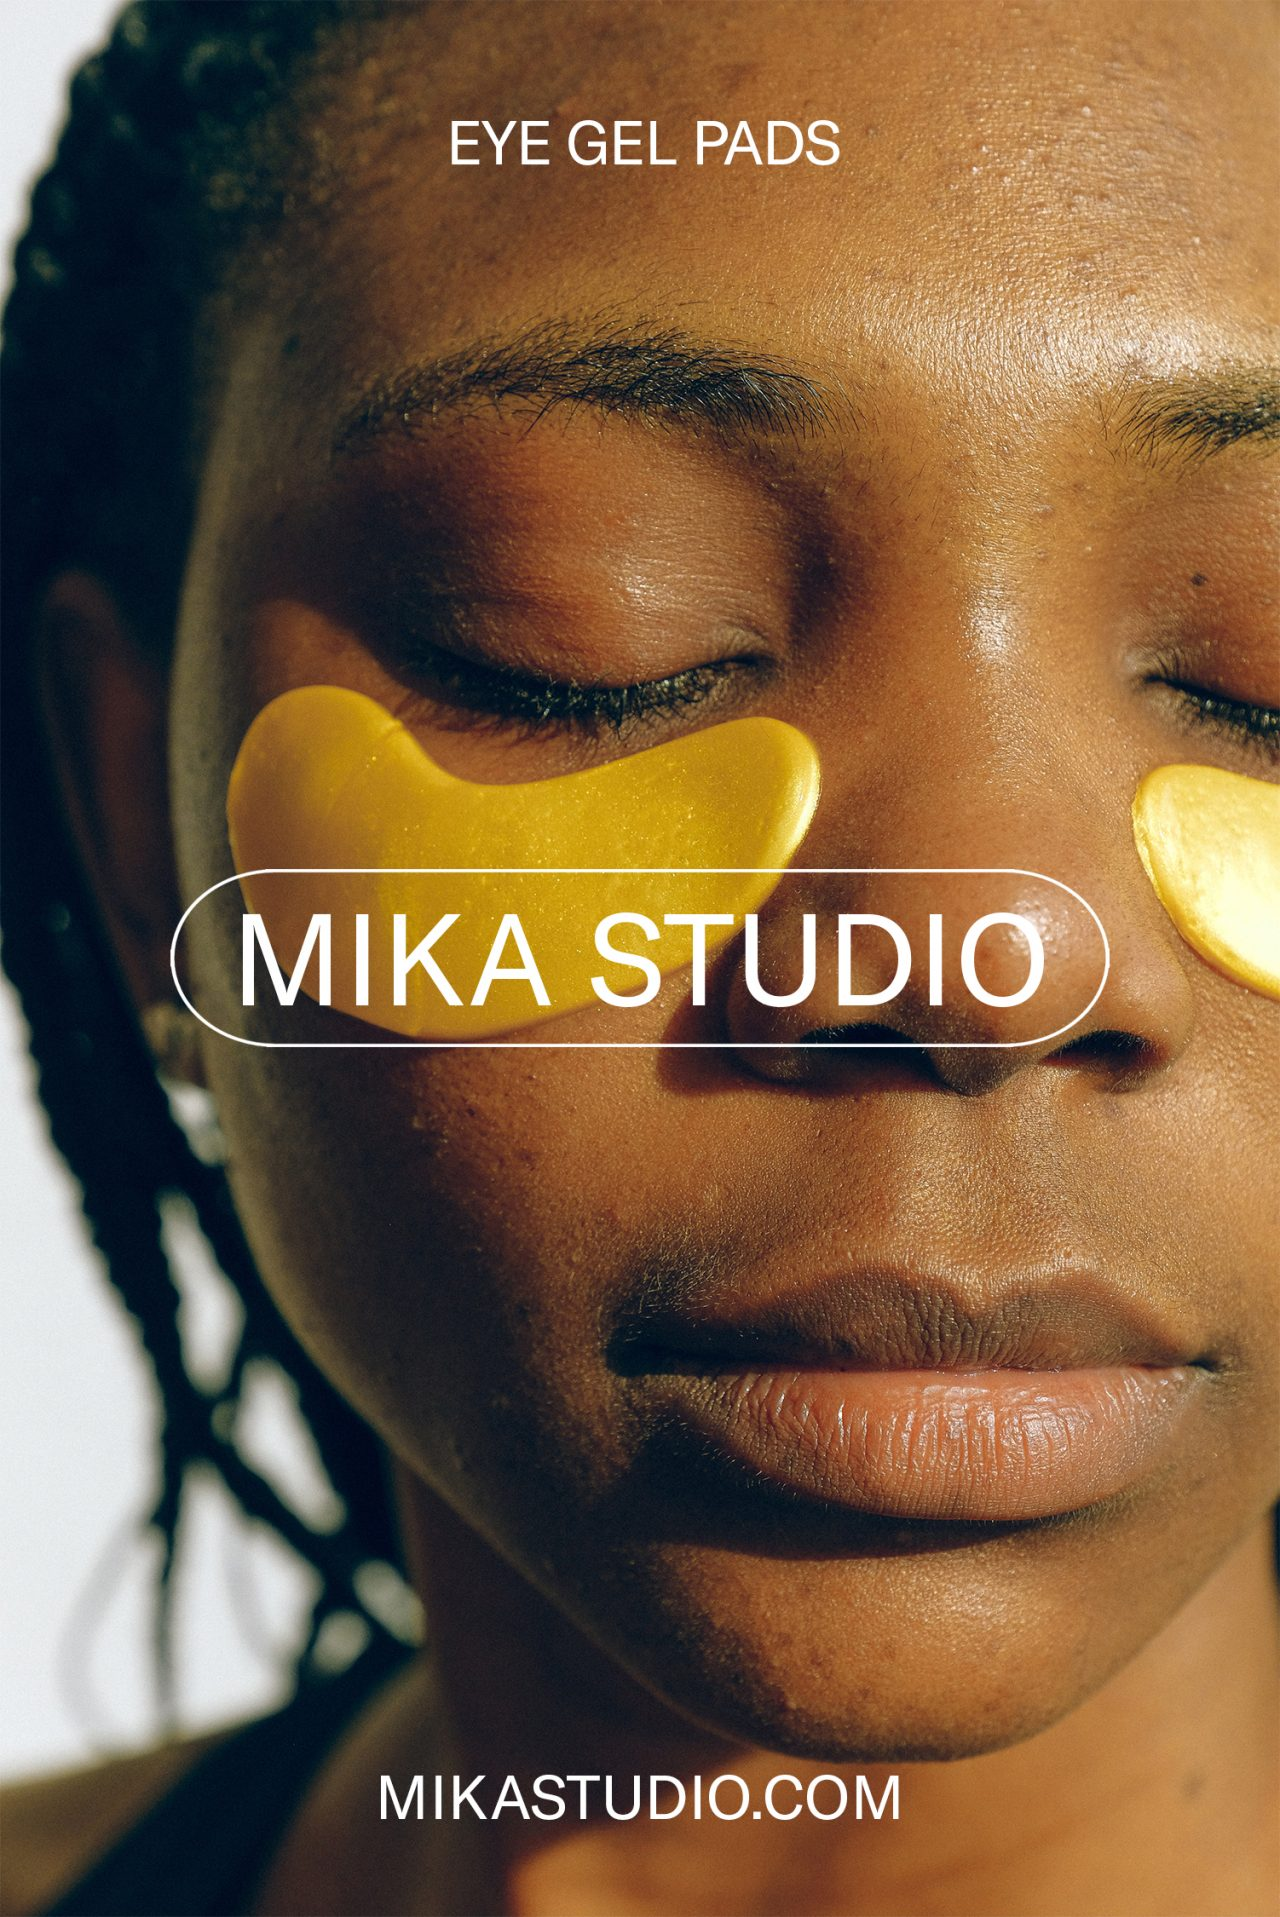 Mika Studio